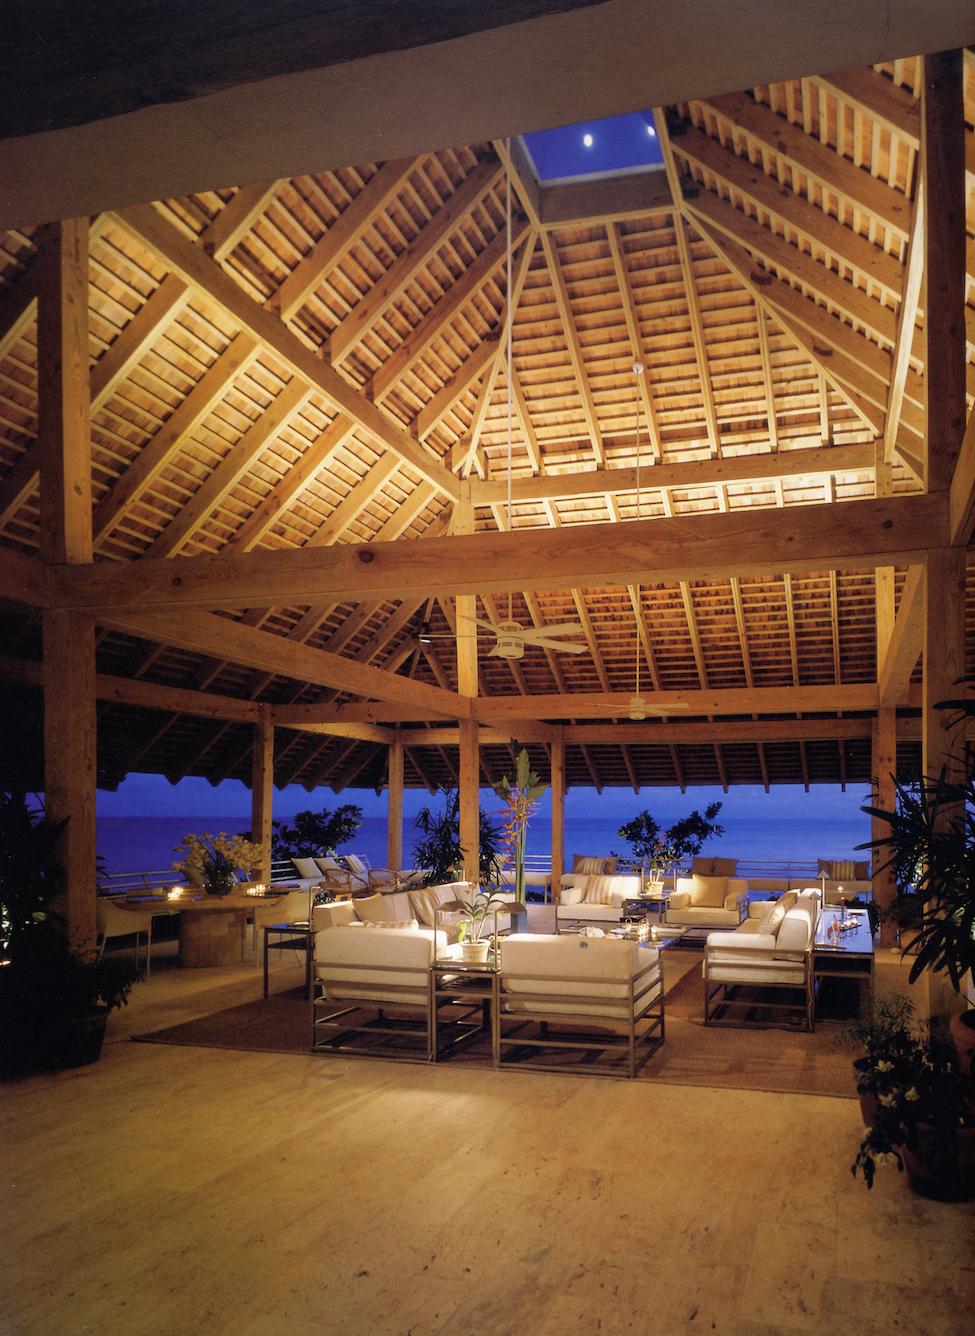 JA furniture outdoor furniture in the the Dominican Republic.